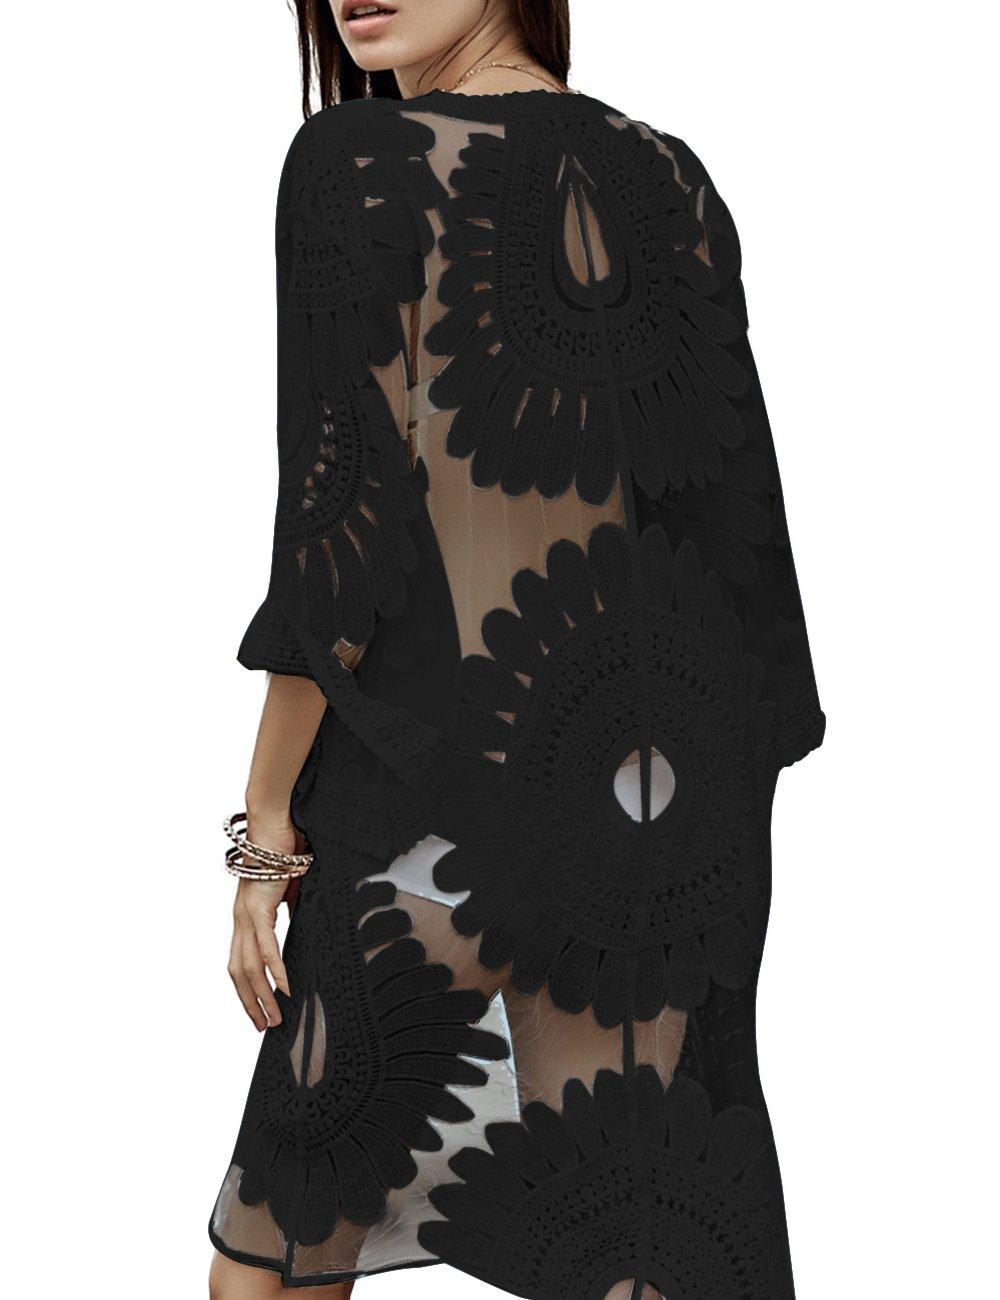 shermie Women's Floral Crochet Lace Beach Swimsuit Cover Ups Plus Size Long Kimono Cardigan Black